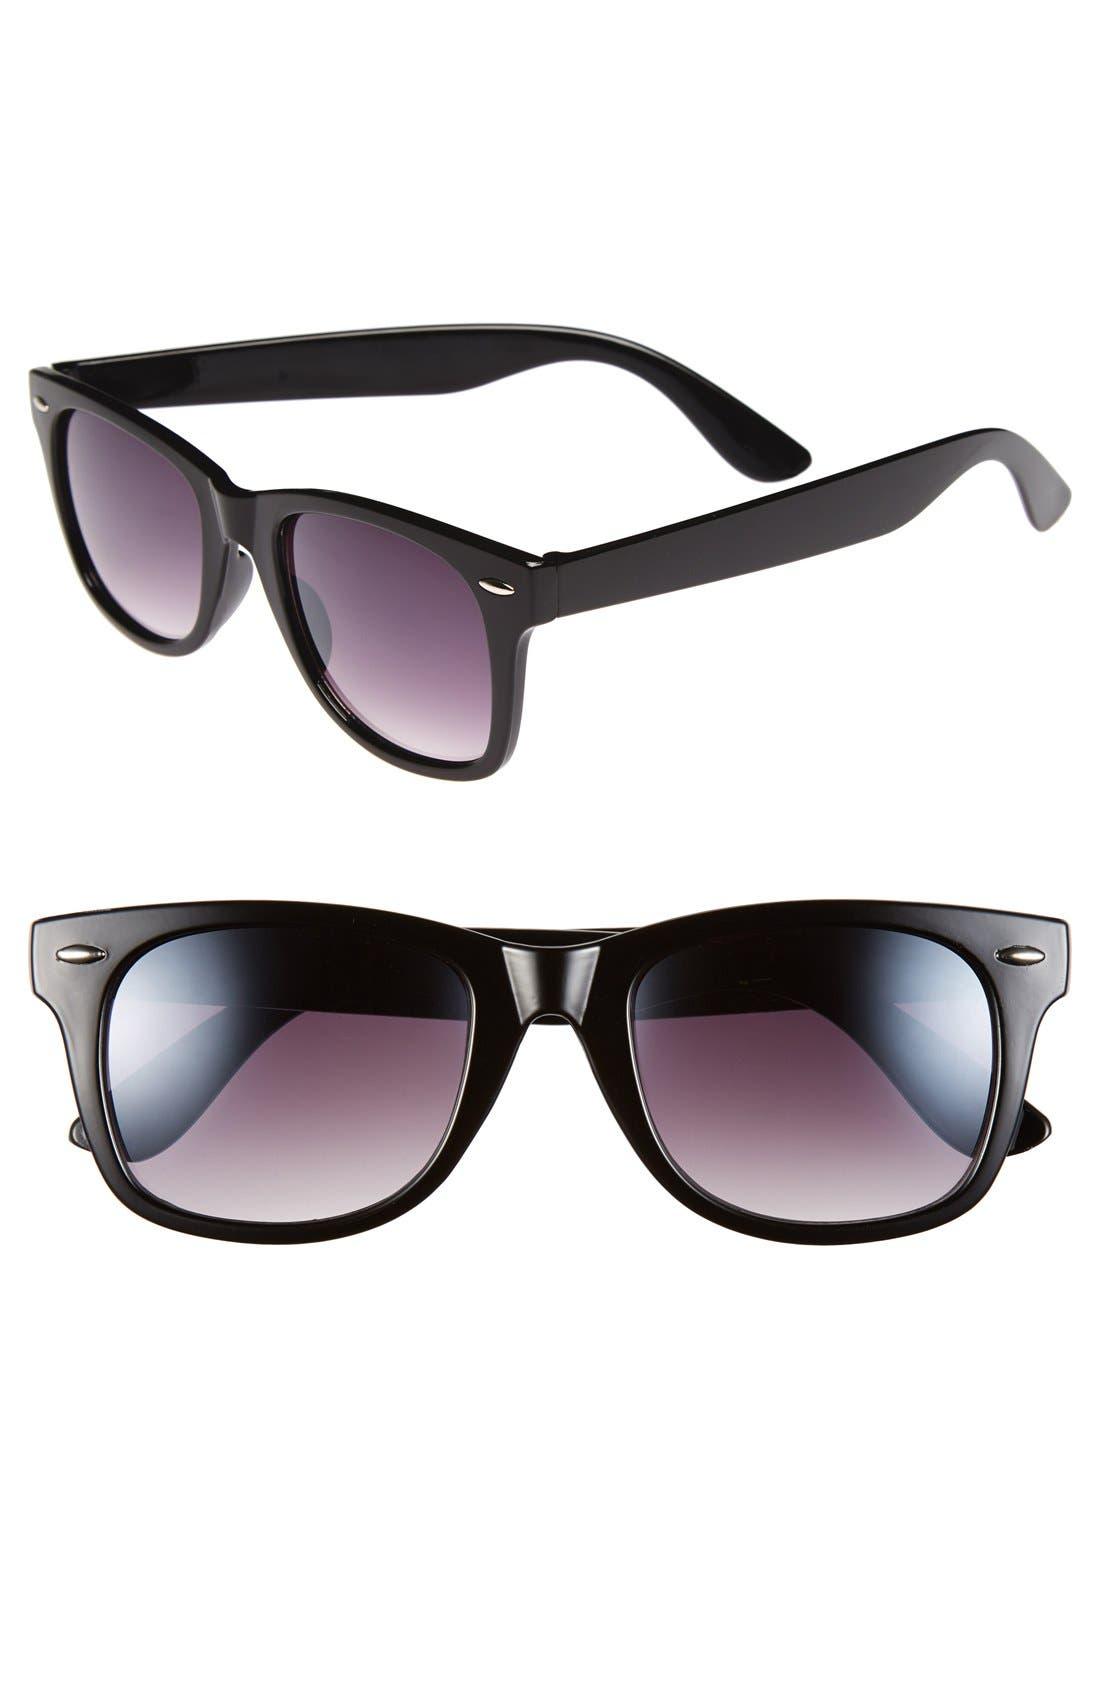 Main Image - Icon Eyewear 59mm Retro Sunglasses